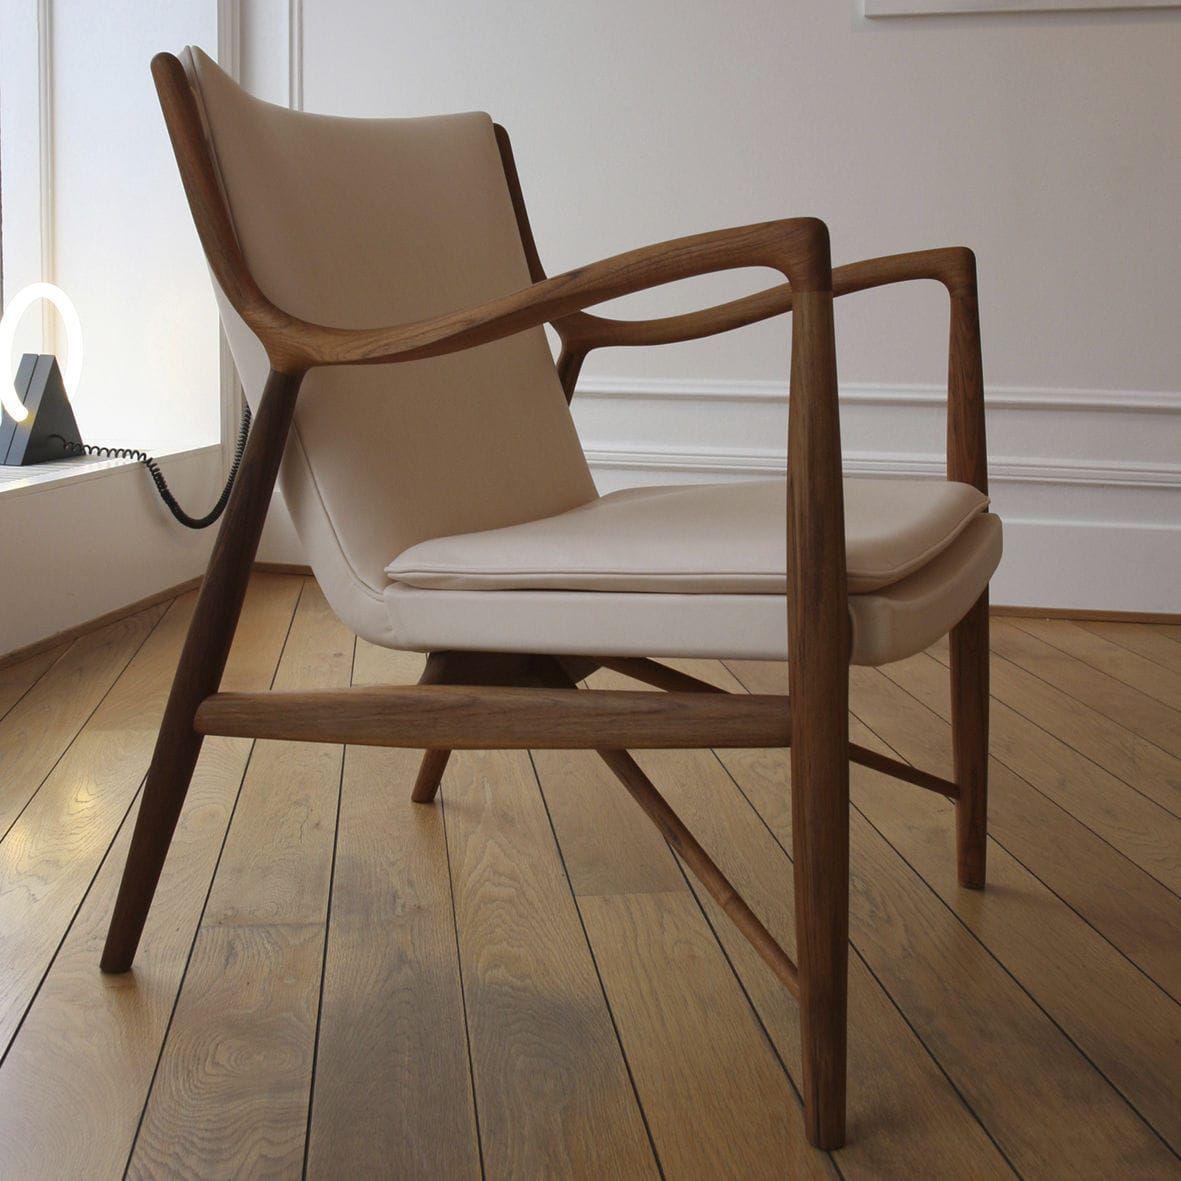 Fauteuil design scandinave en bois en tissu en cuir 45 ONE